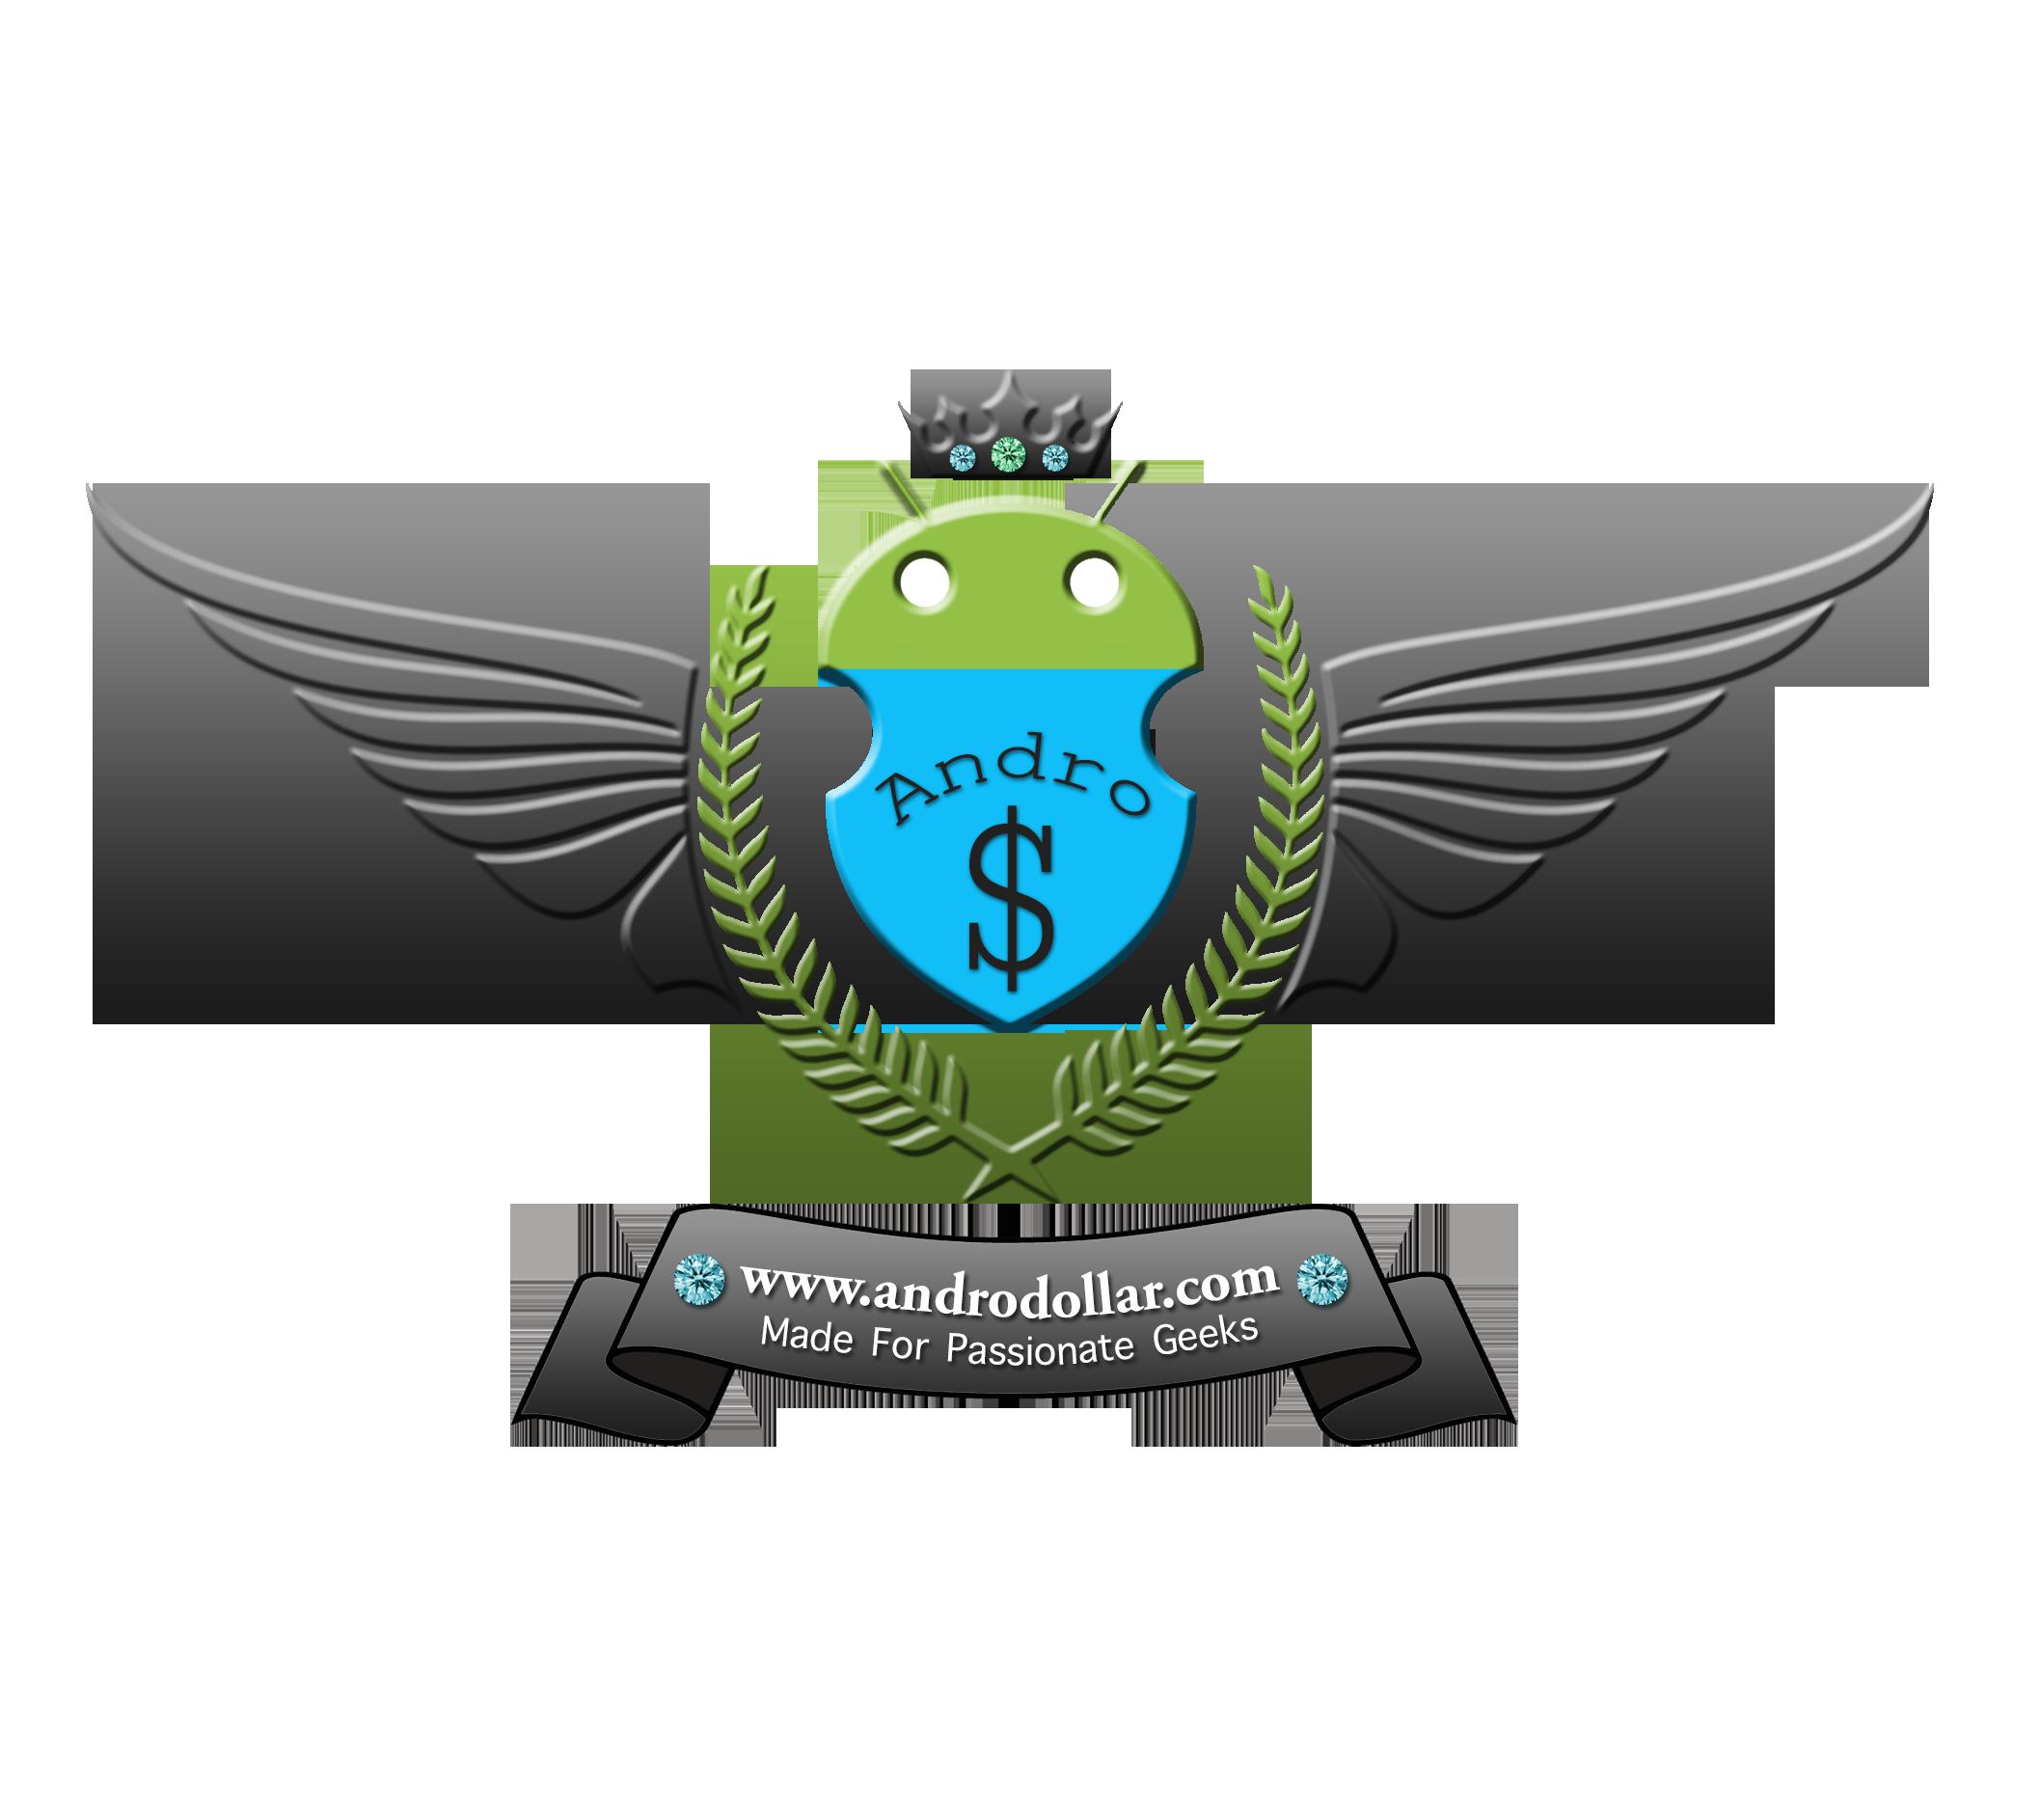 ANDRO DOLLAR LOGO - NEW Andro Dollar Logo